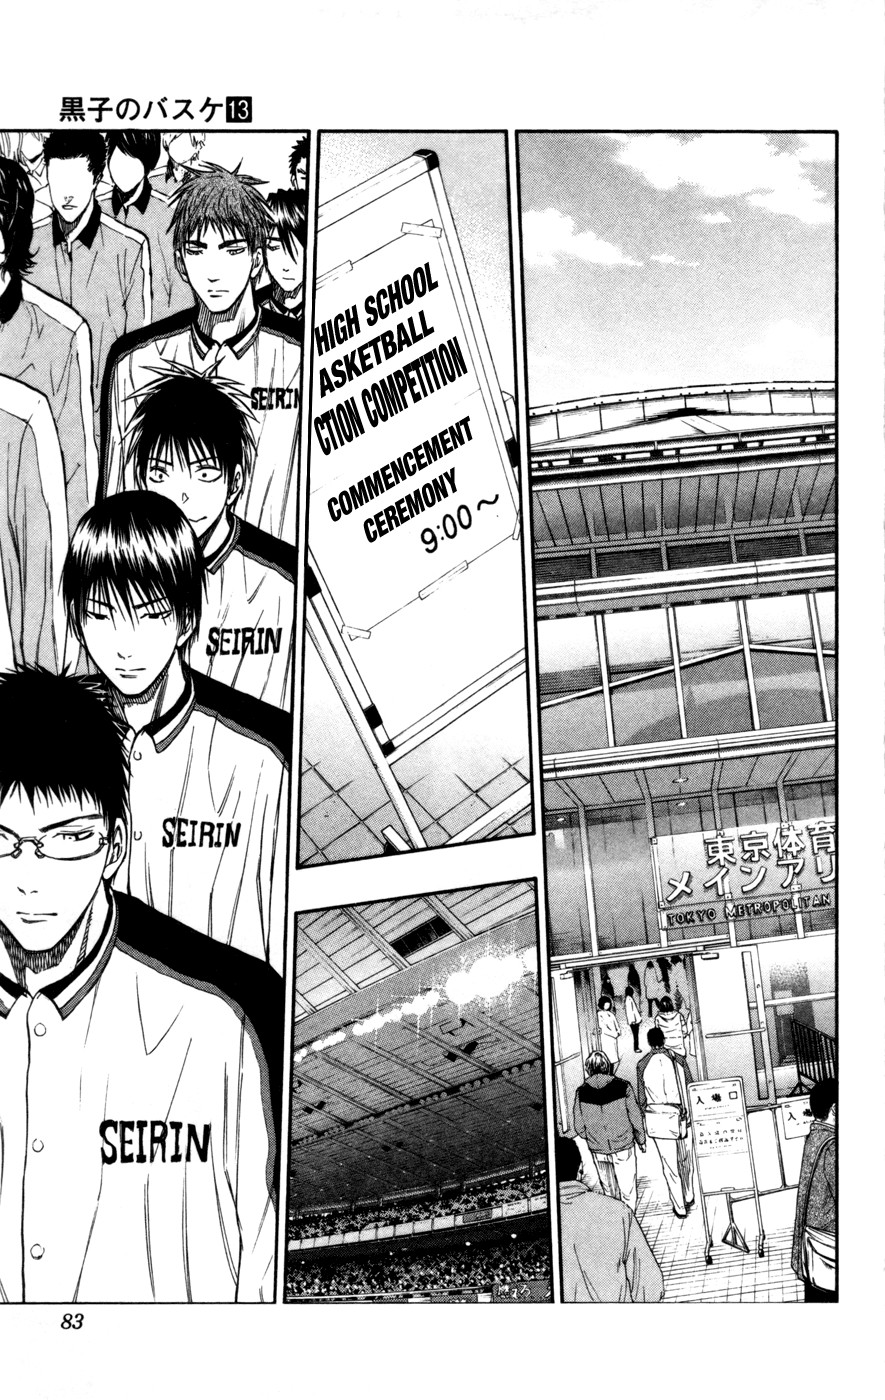 Kuroko no Basket Manga Chapter 112 - Image 17